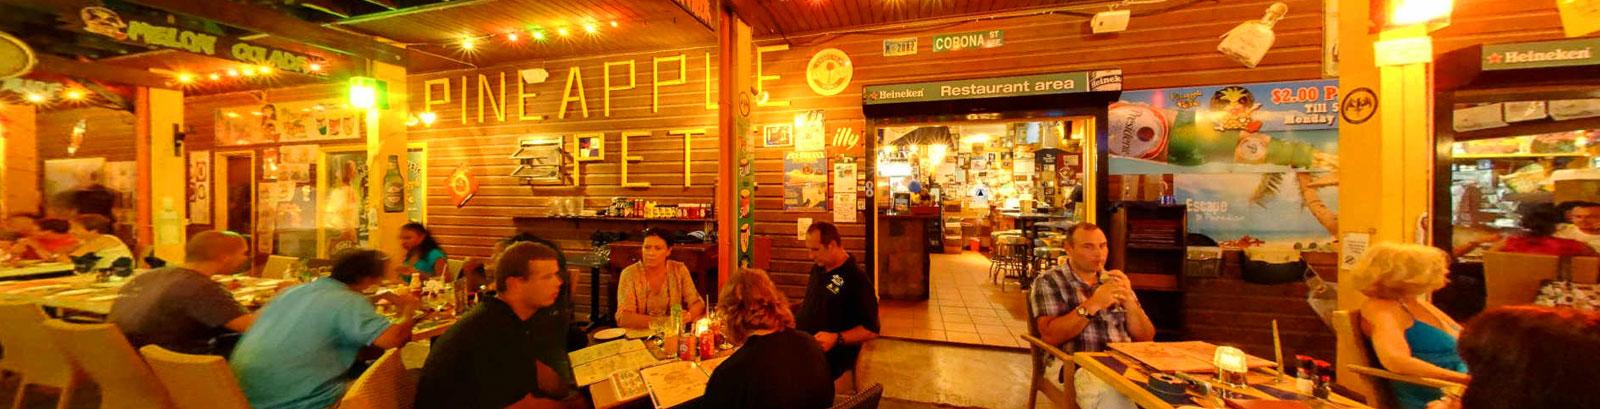 Pineapple Pete Restaurant & Bar - Nos recommandations au Simpson Bay Resort